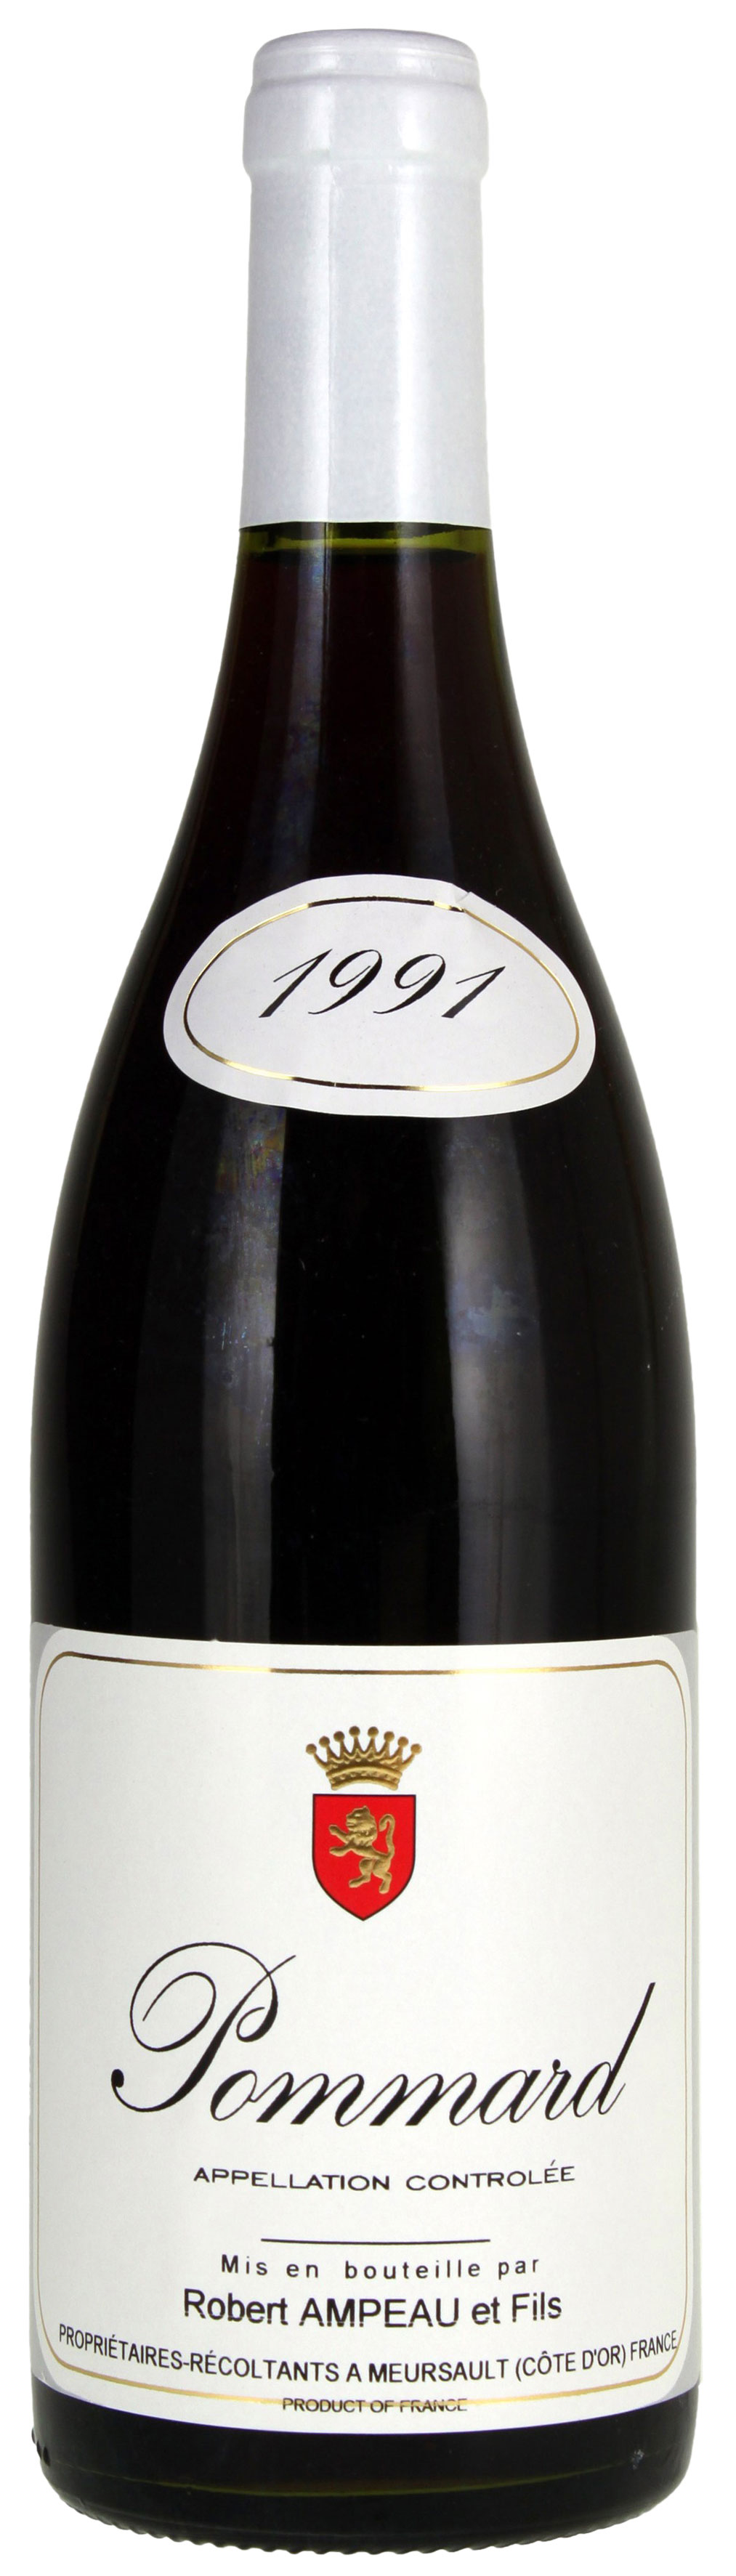 1991 Domaine Robert Ampeau & Fils Pommard фото